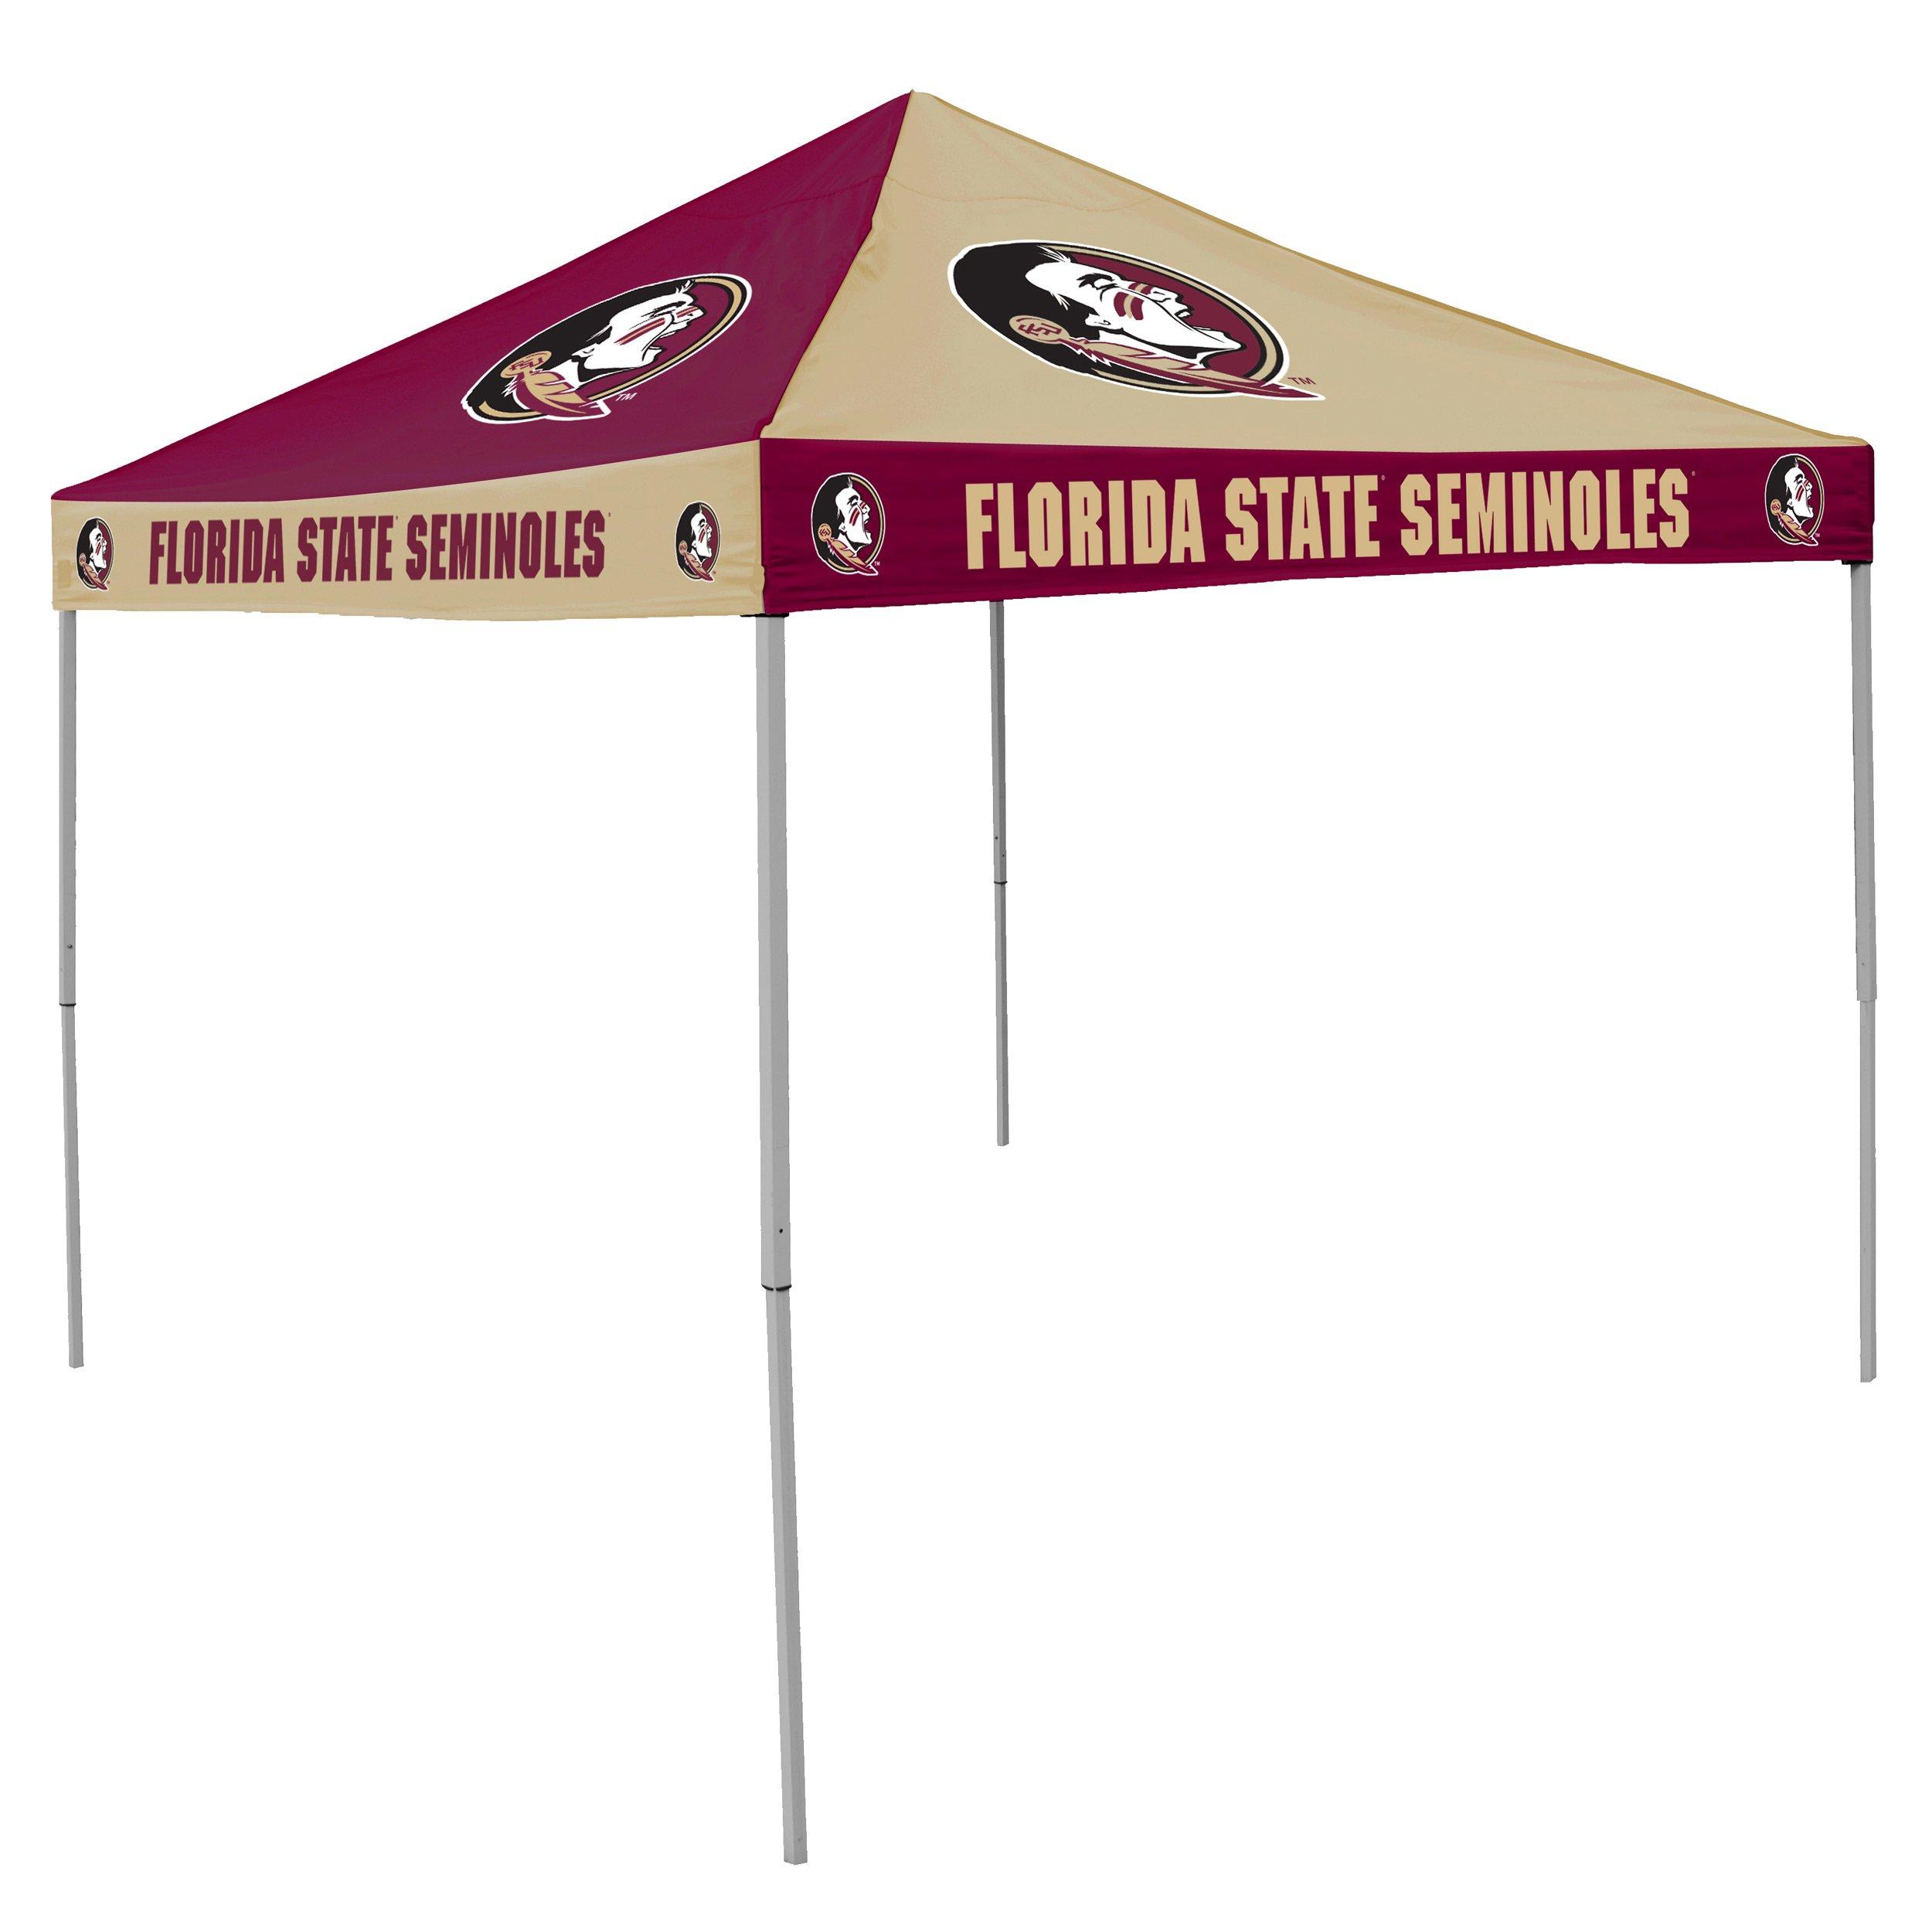 NCAA Florida State Seminoles 9-Foot x 9-Foot Pinwheel Tailgating Canopy, Garnet/Gold